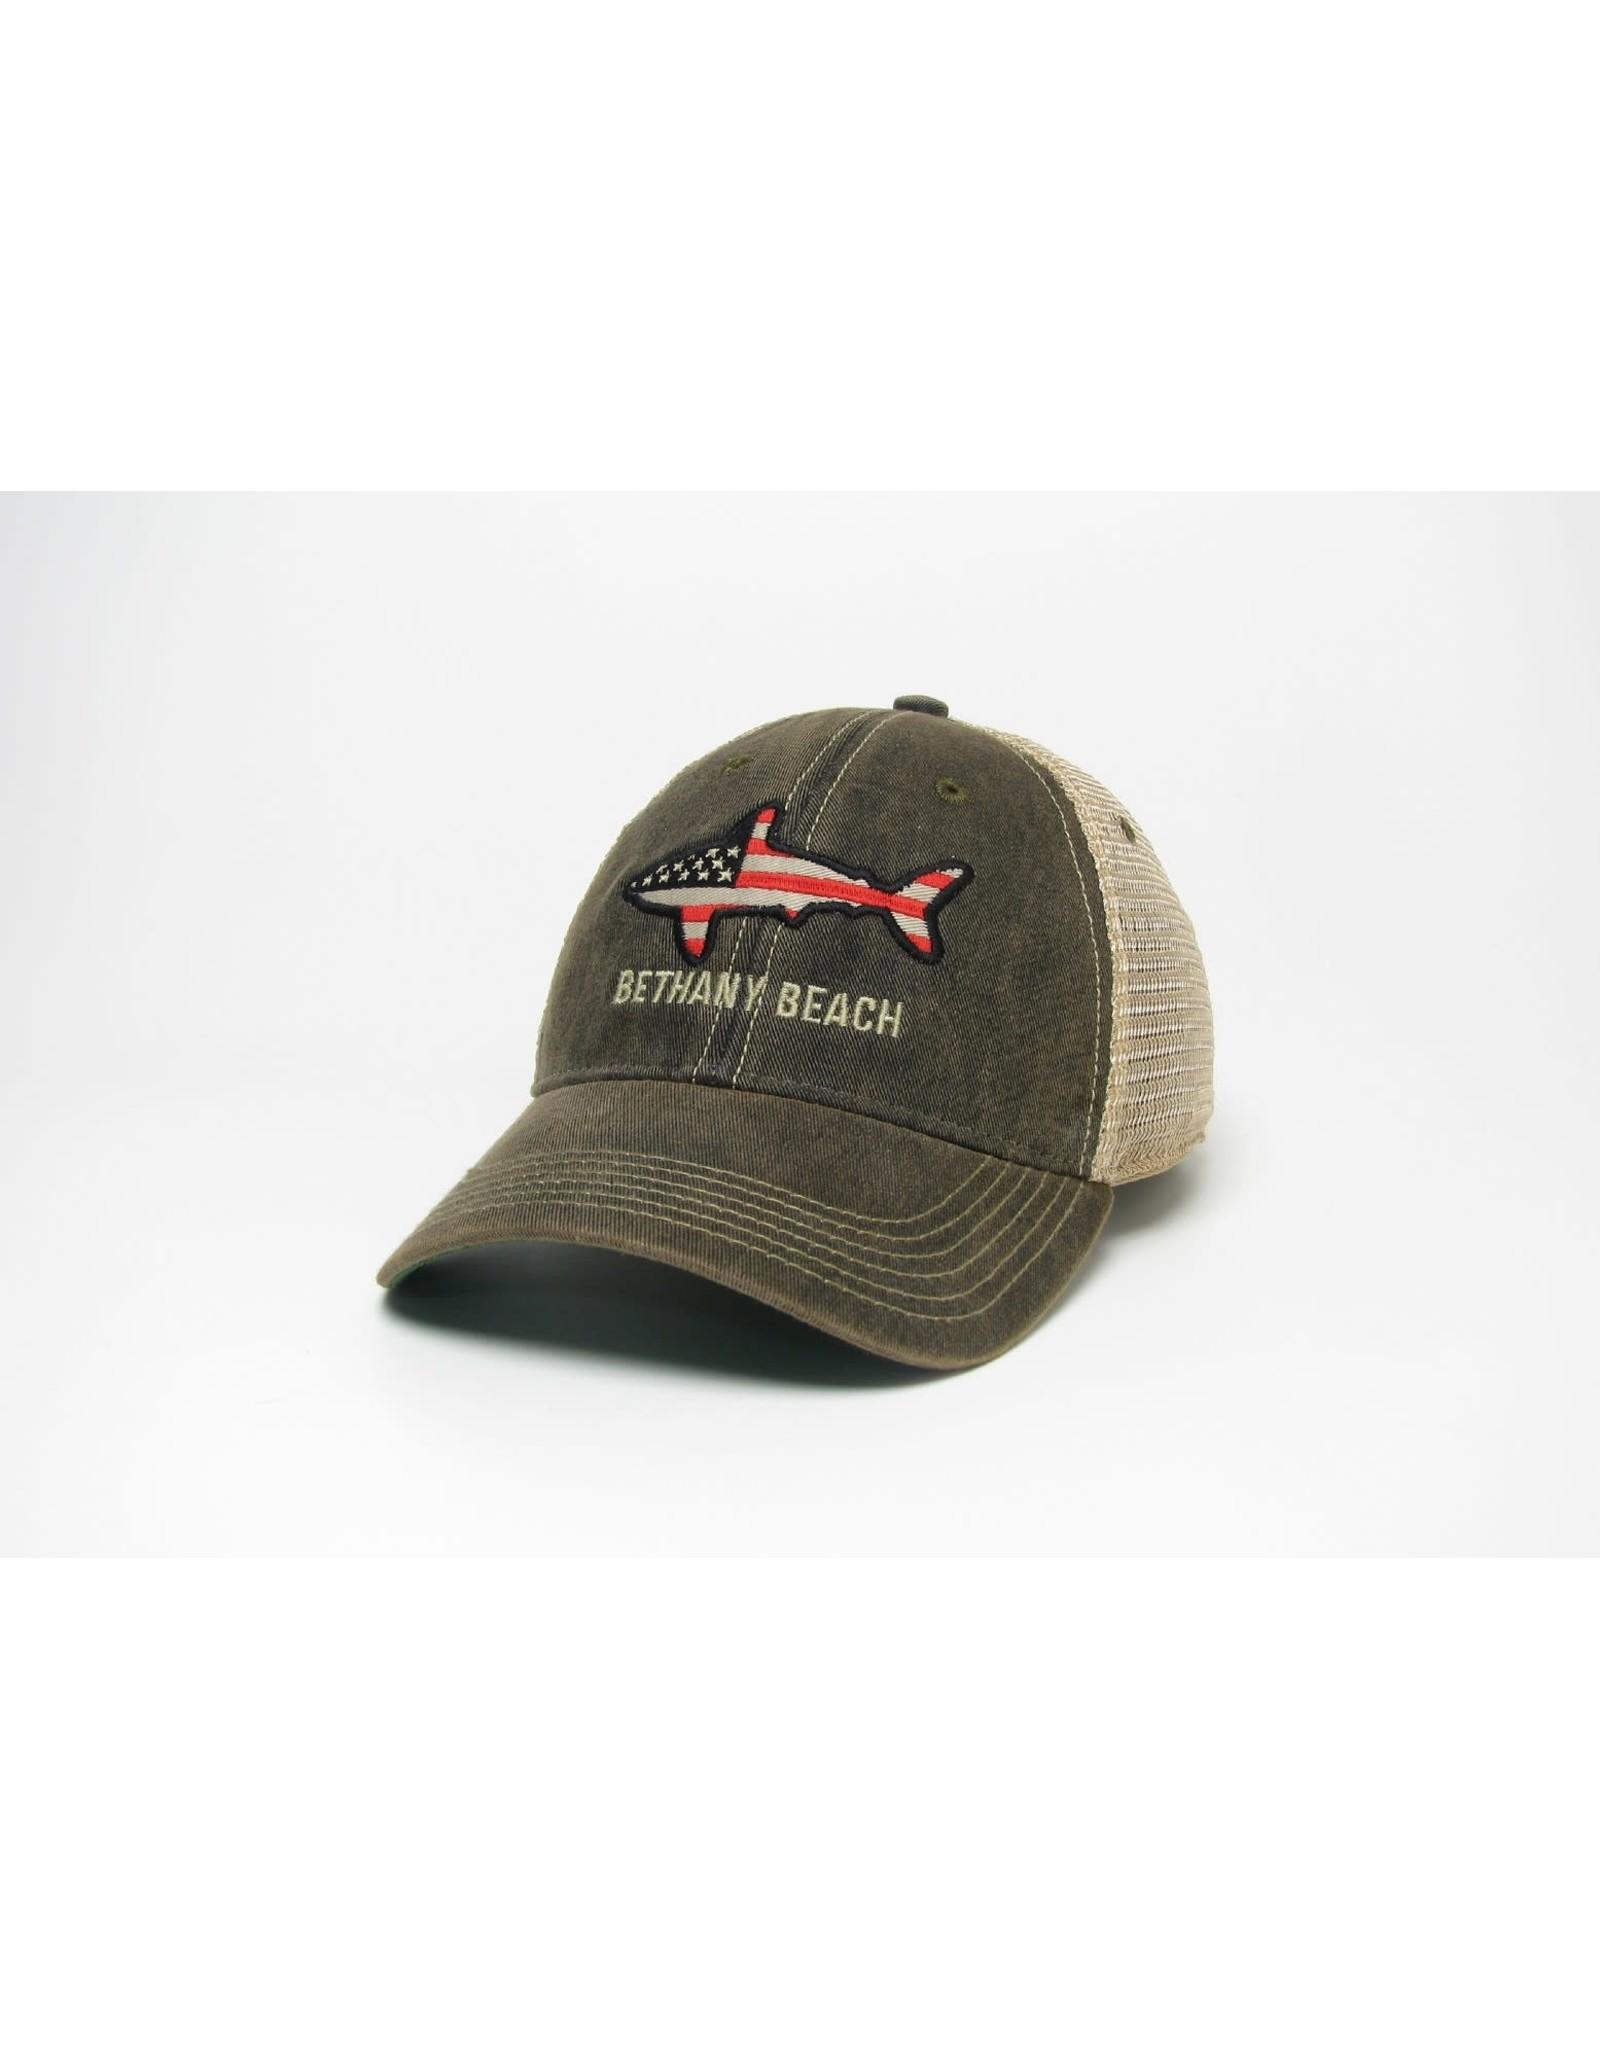 LEGACY ATHLETICS BETHANY LEGACY OLD FAVORITE TRUCKER HAT BLACK FLAG SHARK